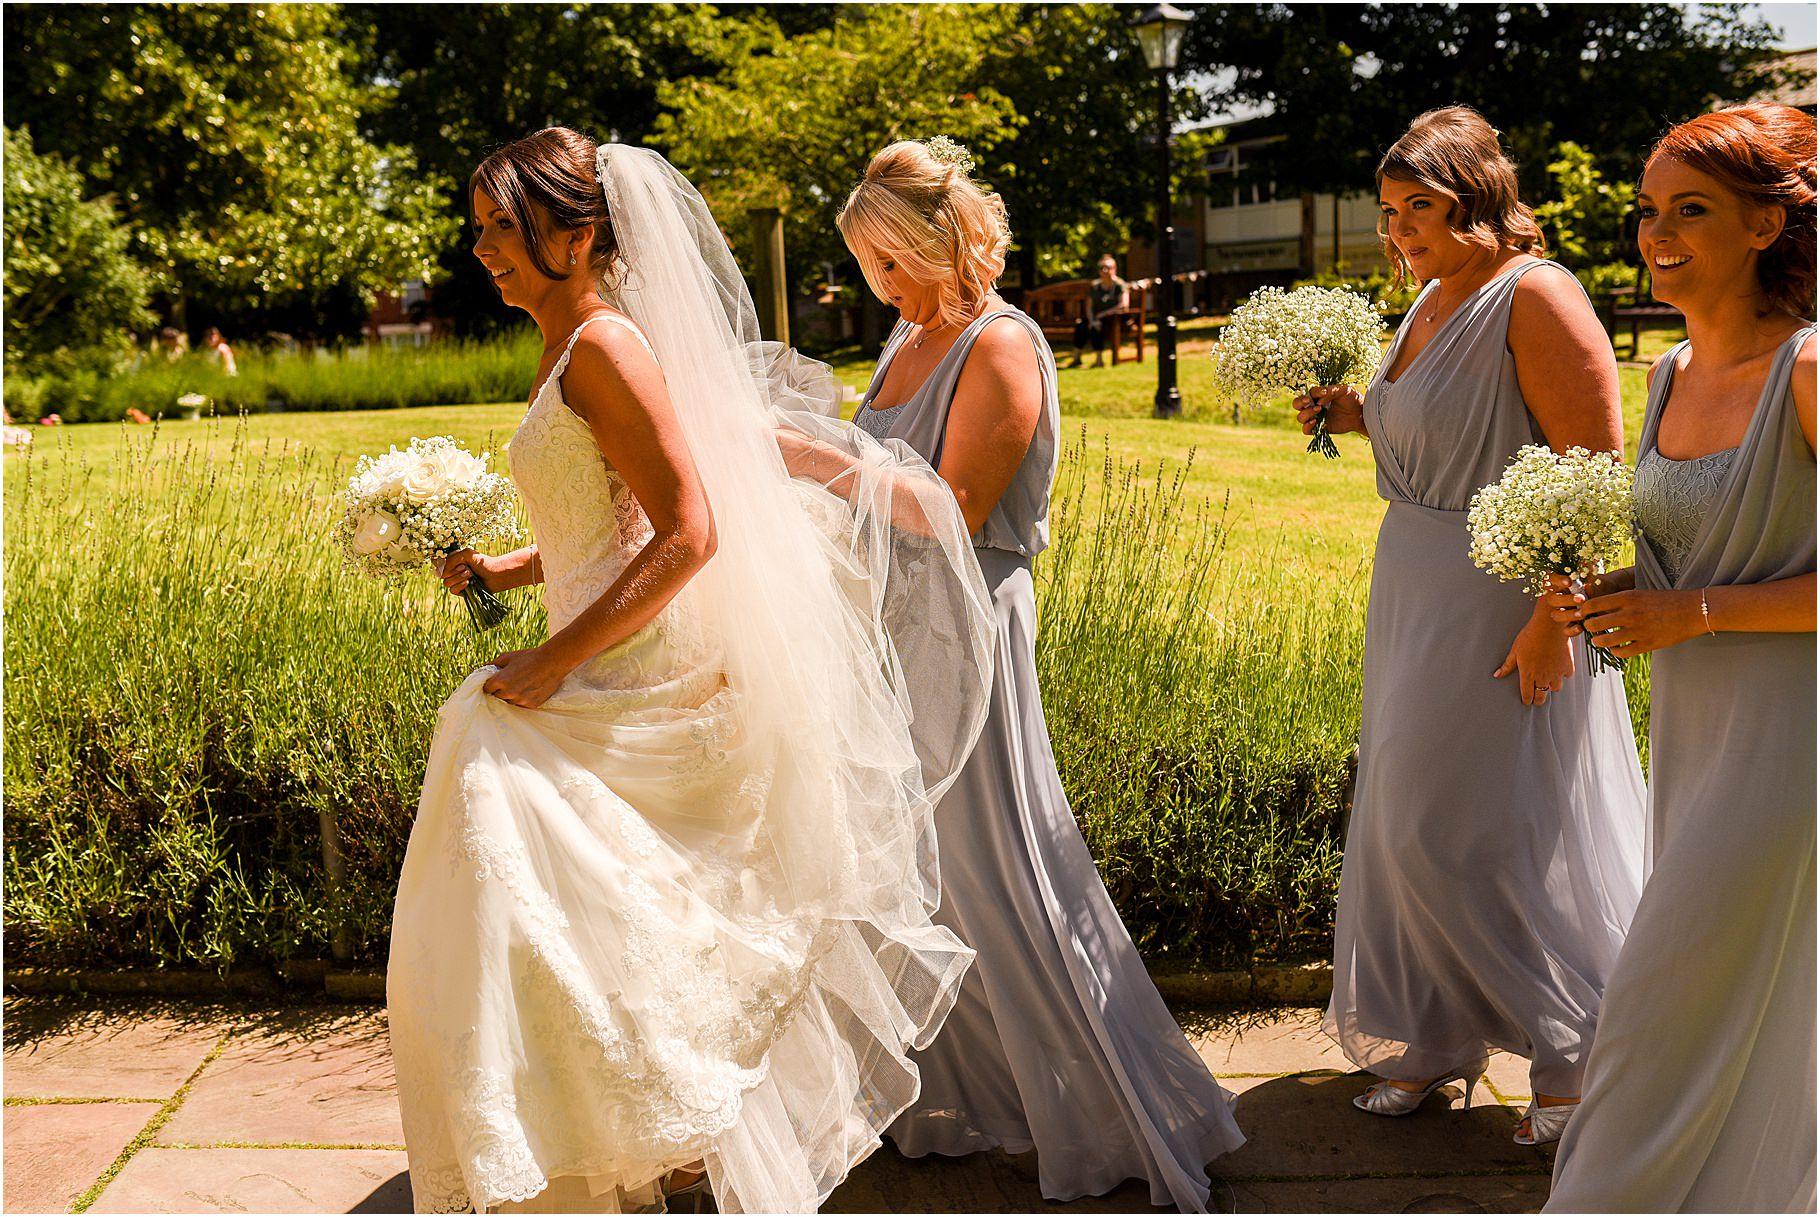 the-villa-wrea-green-wedding-photographer-28.jpg